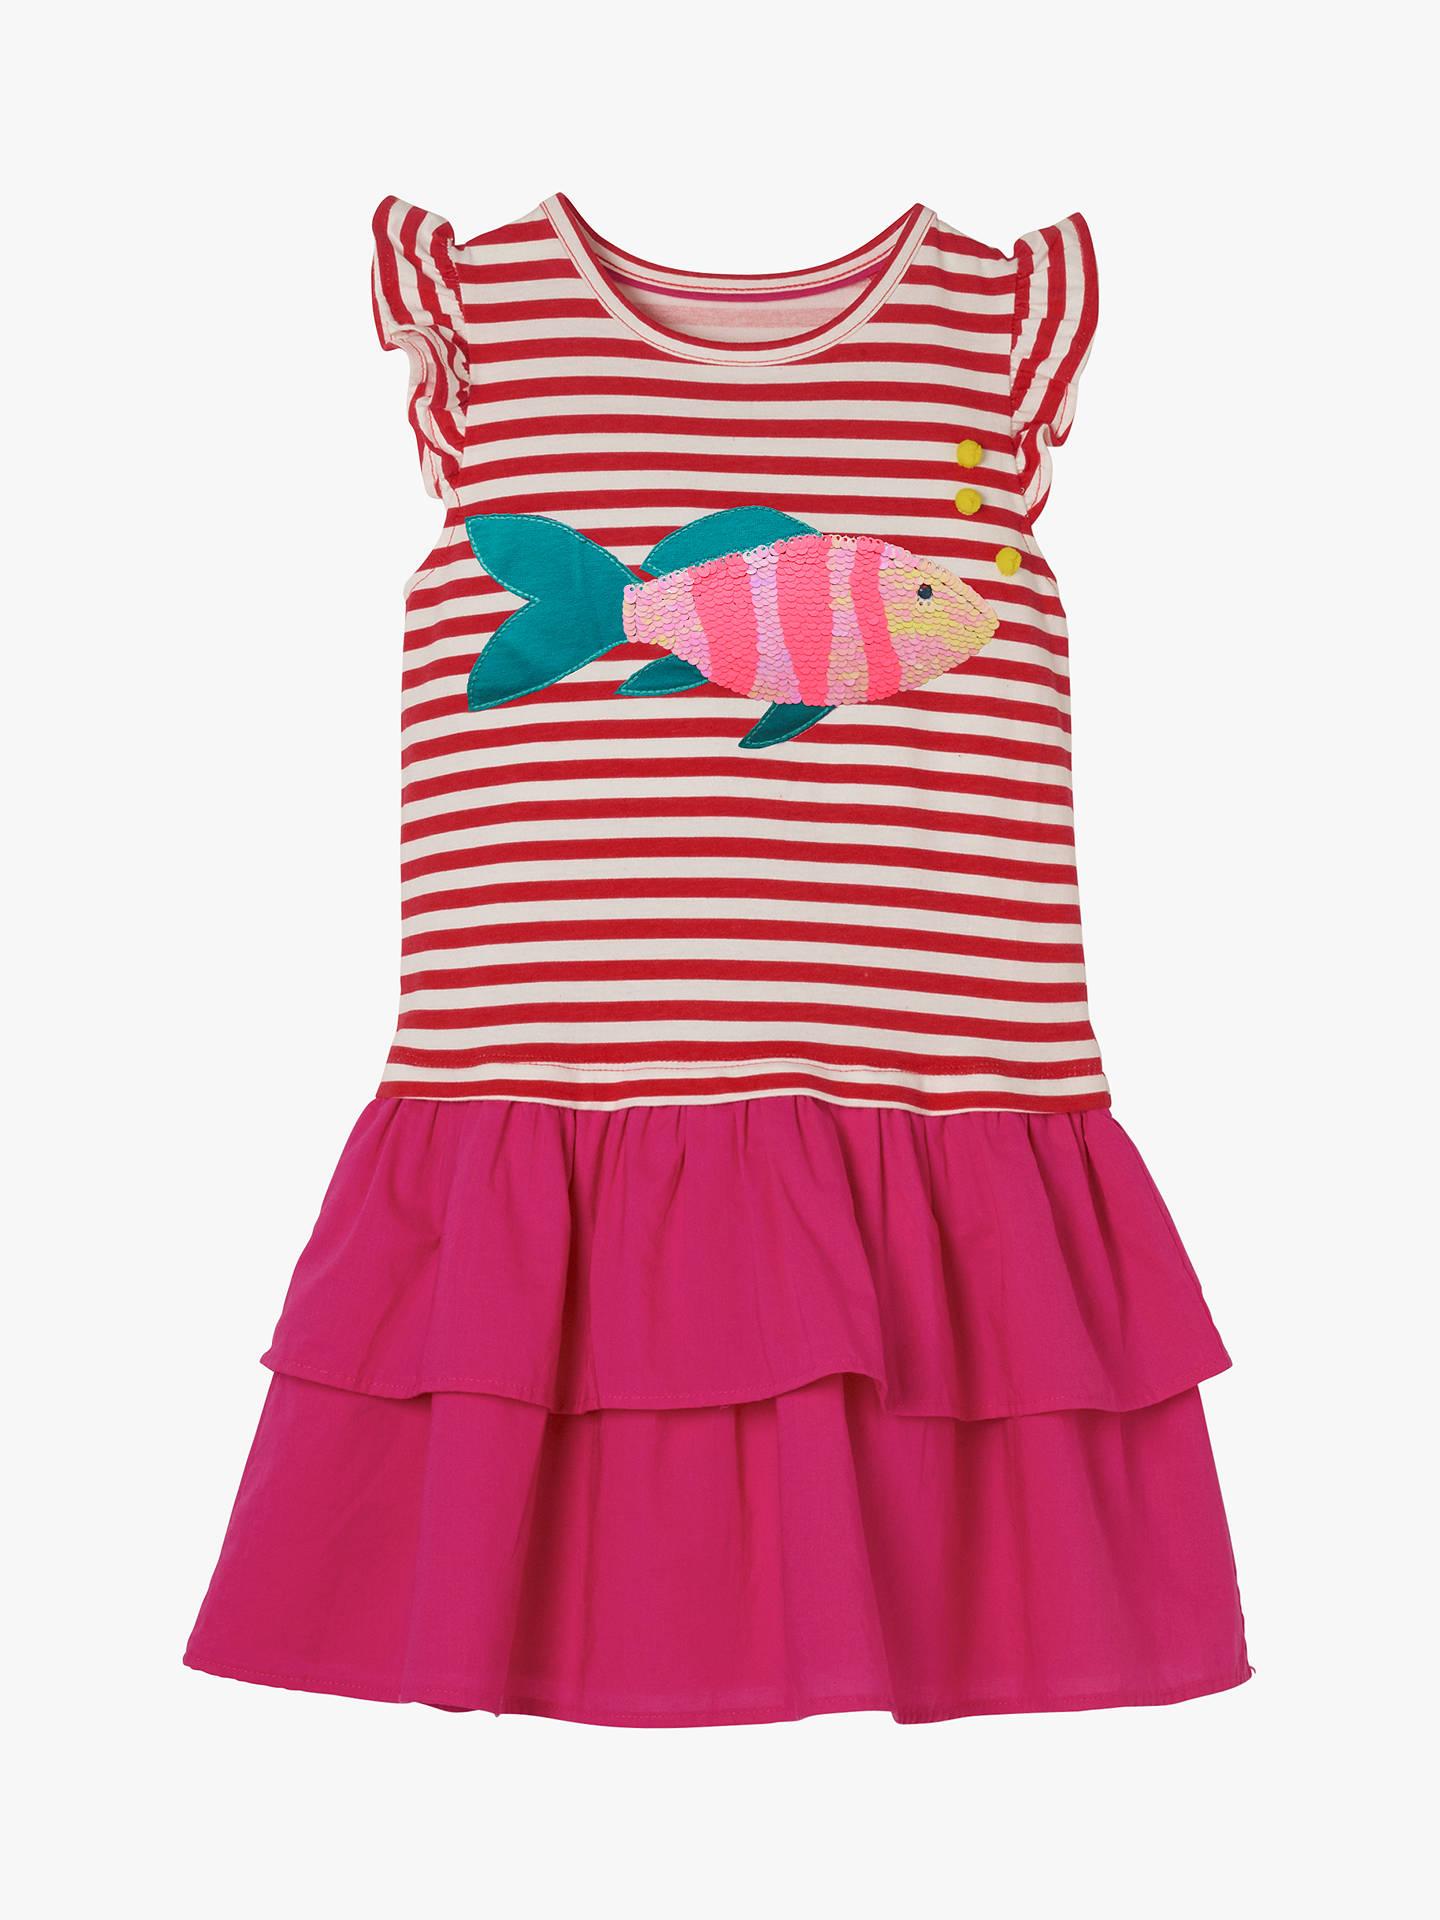 7d0191dc Buy Mini Boden Girls' Fish Sequin Dress, Red, 3-4 years Online ...